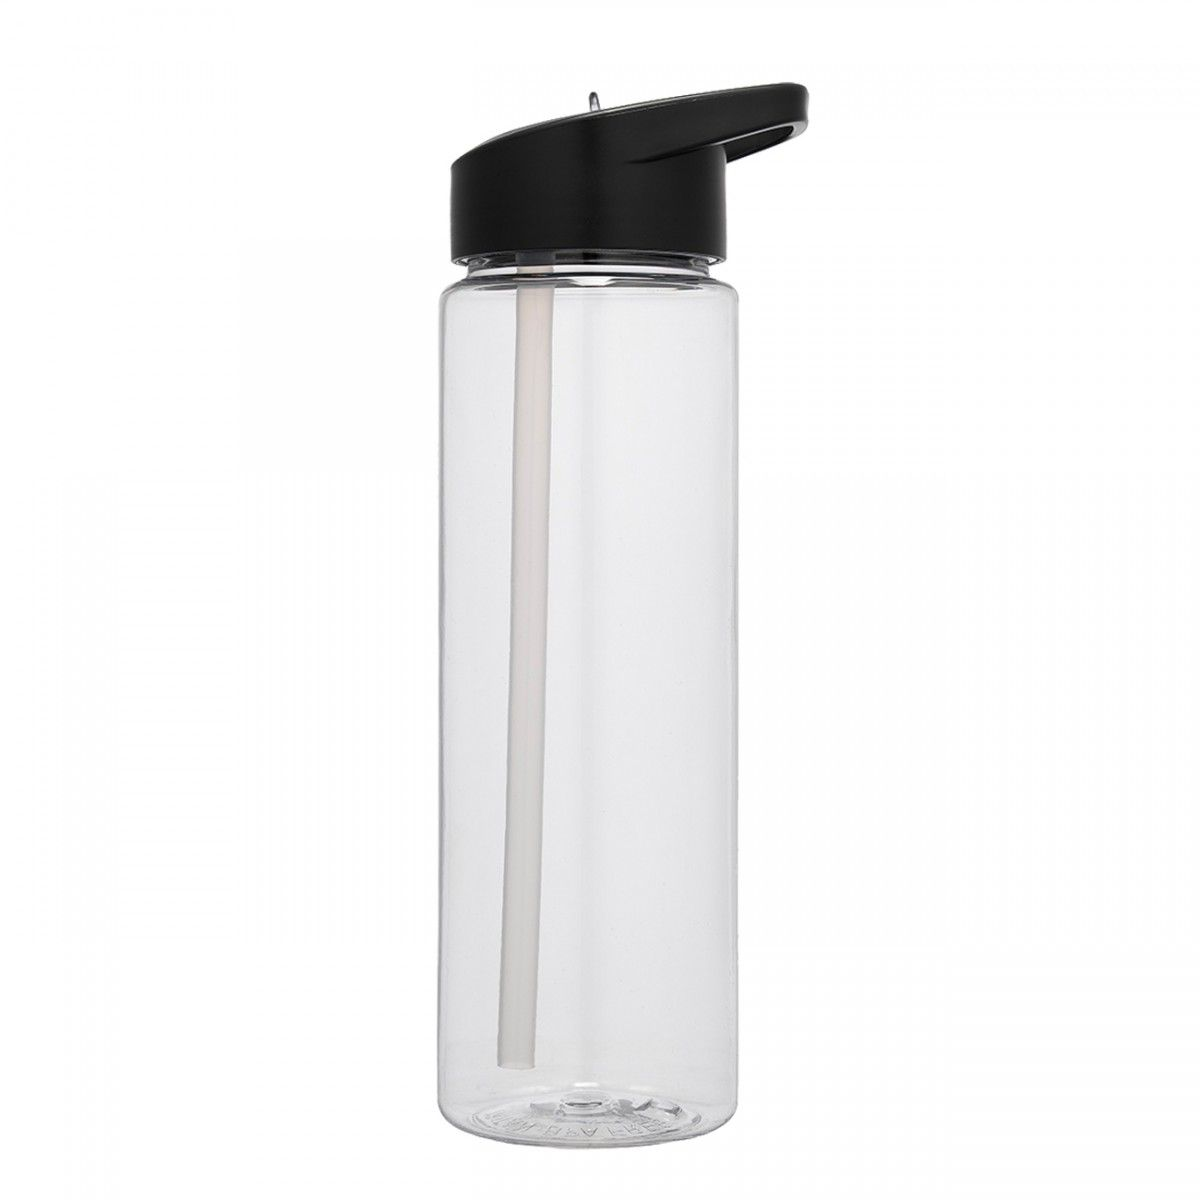 71ed9d4b3e Summit Tritan Sports Bottle 24 Oz - Save A Cup   Cameo Silhoutette ...